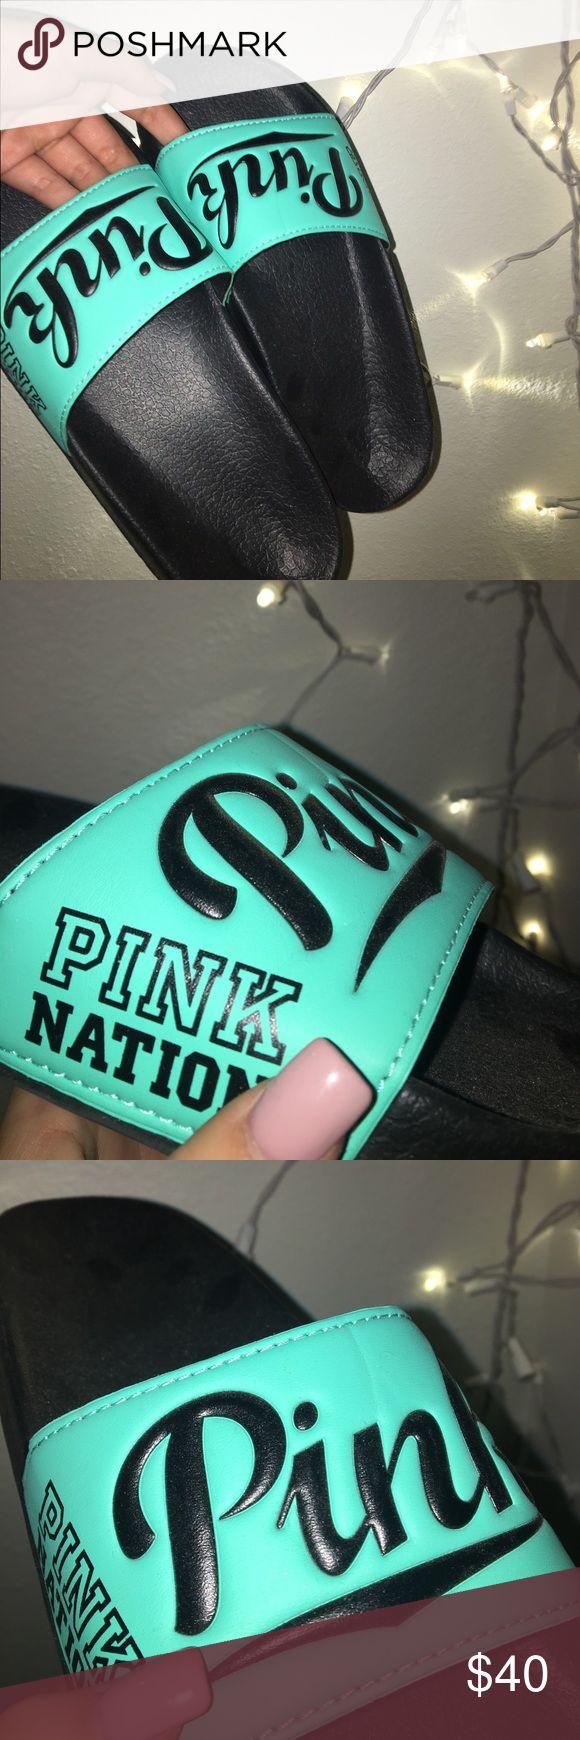 PINK Victoria Secret Slides Pink Slides, very comfy and cute. PINK Victoria's Secret Shoes Sandals